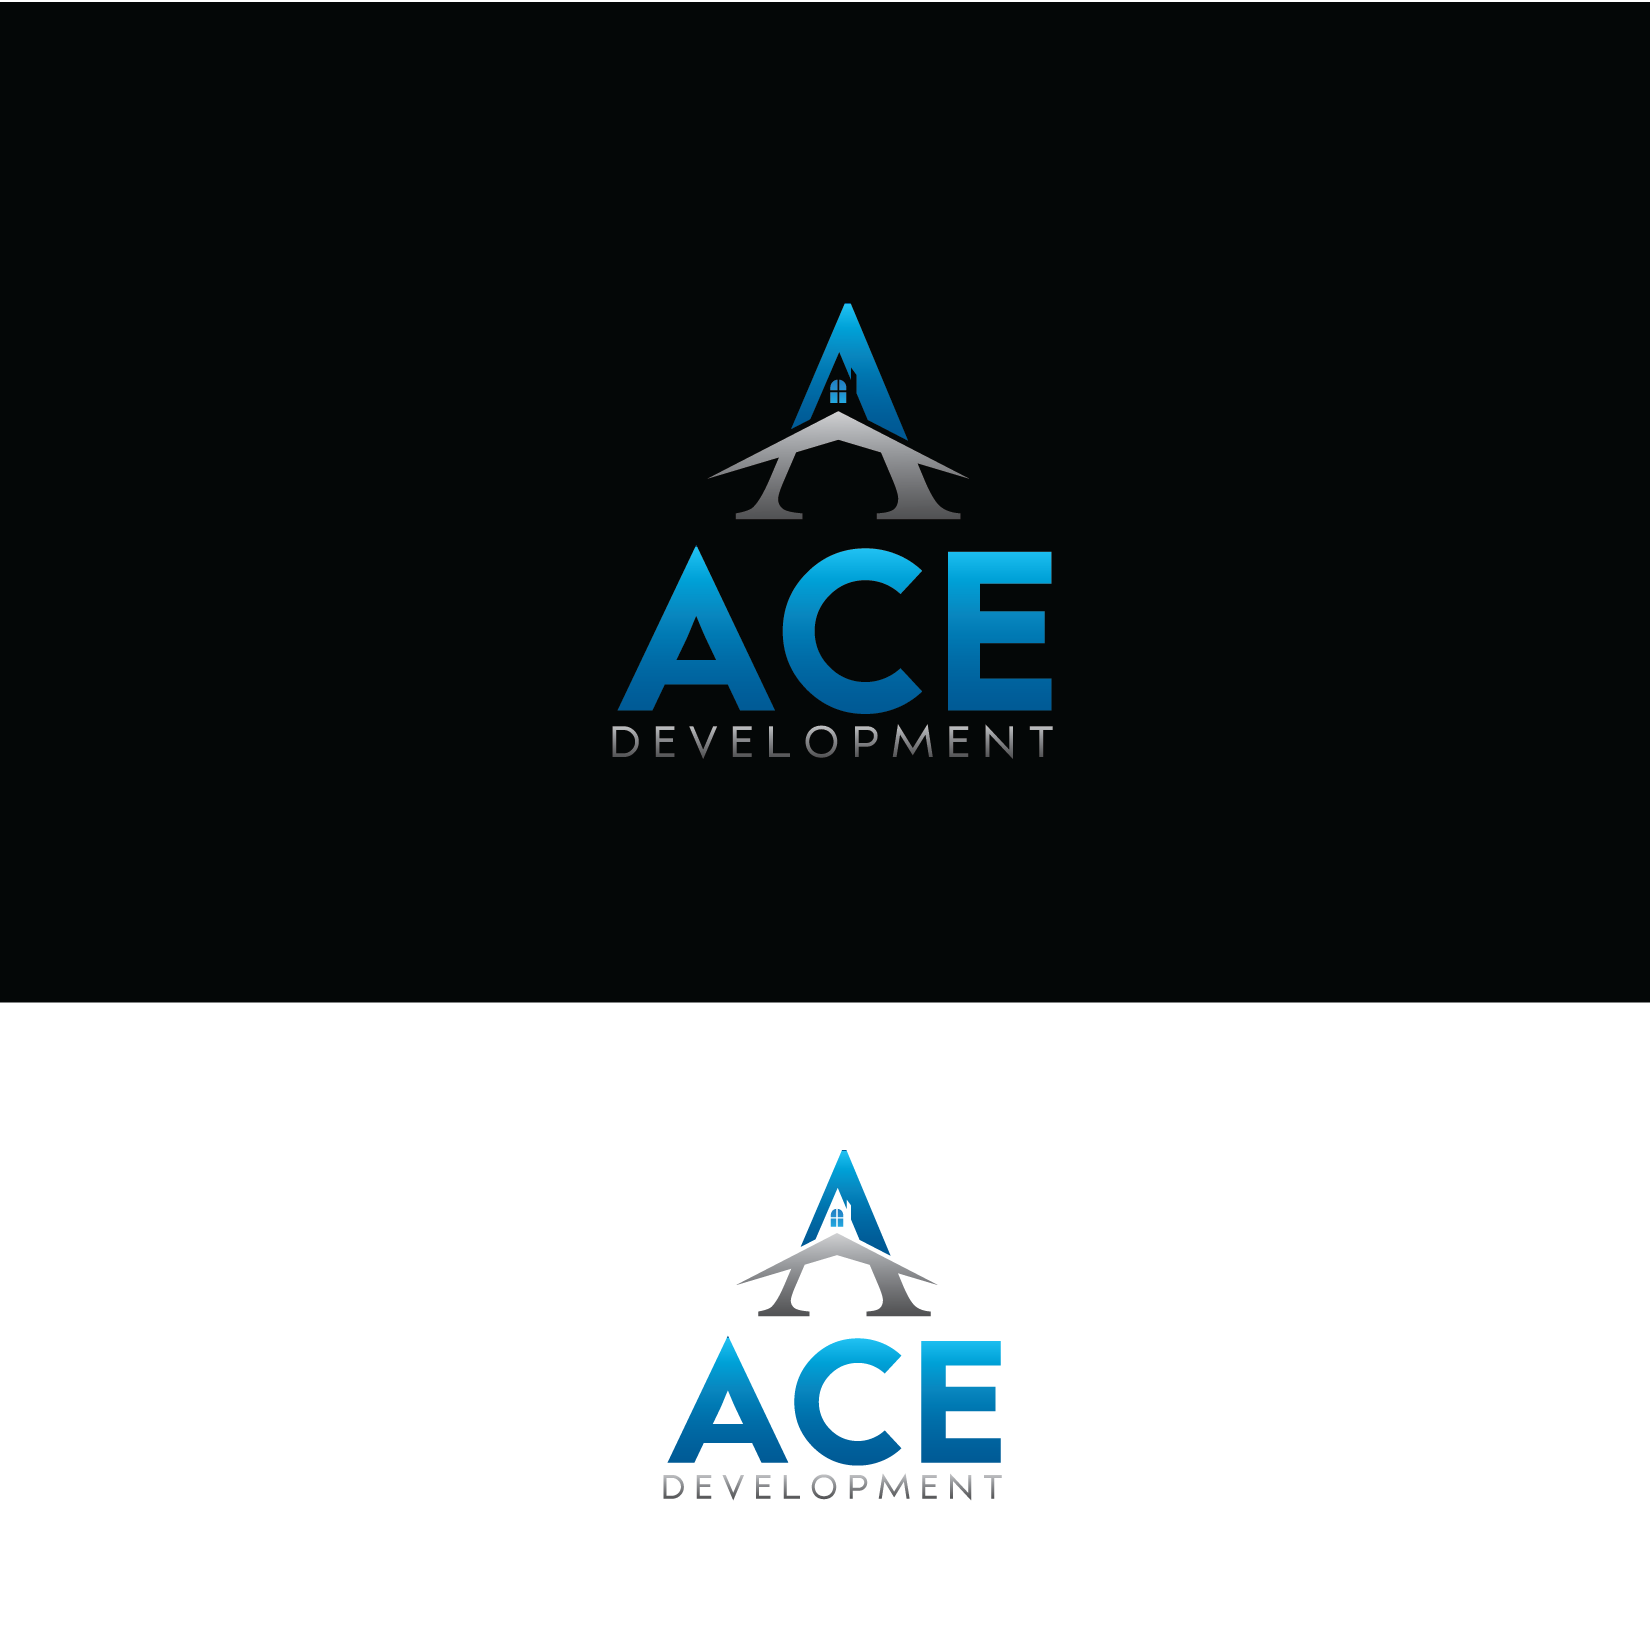 Logo Design by Private User - Entry No. 35 in the Logo Design Contest Fun Logo Design for Ace development.